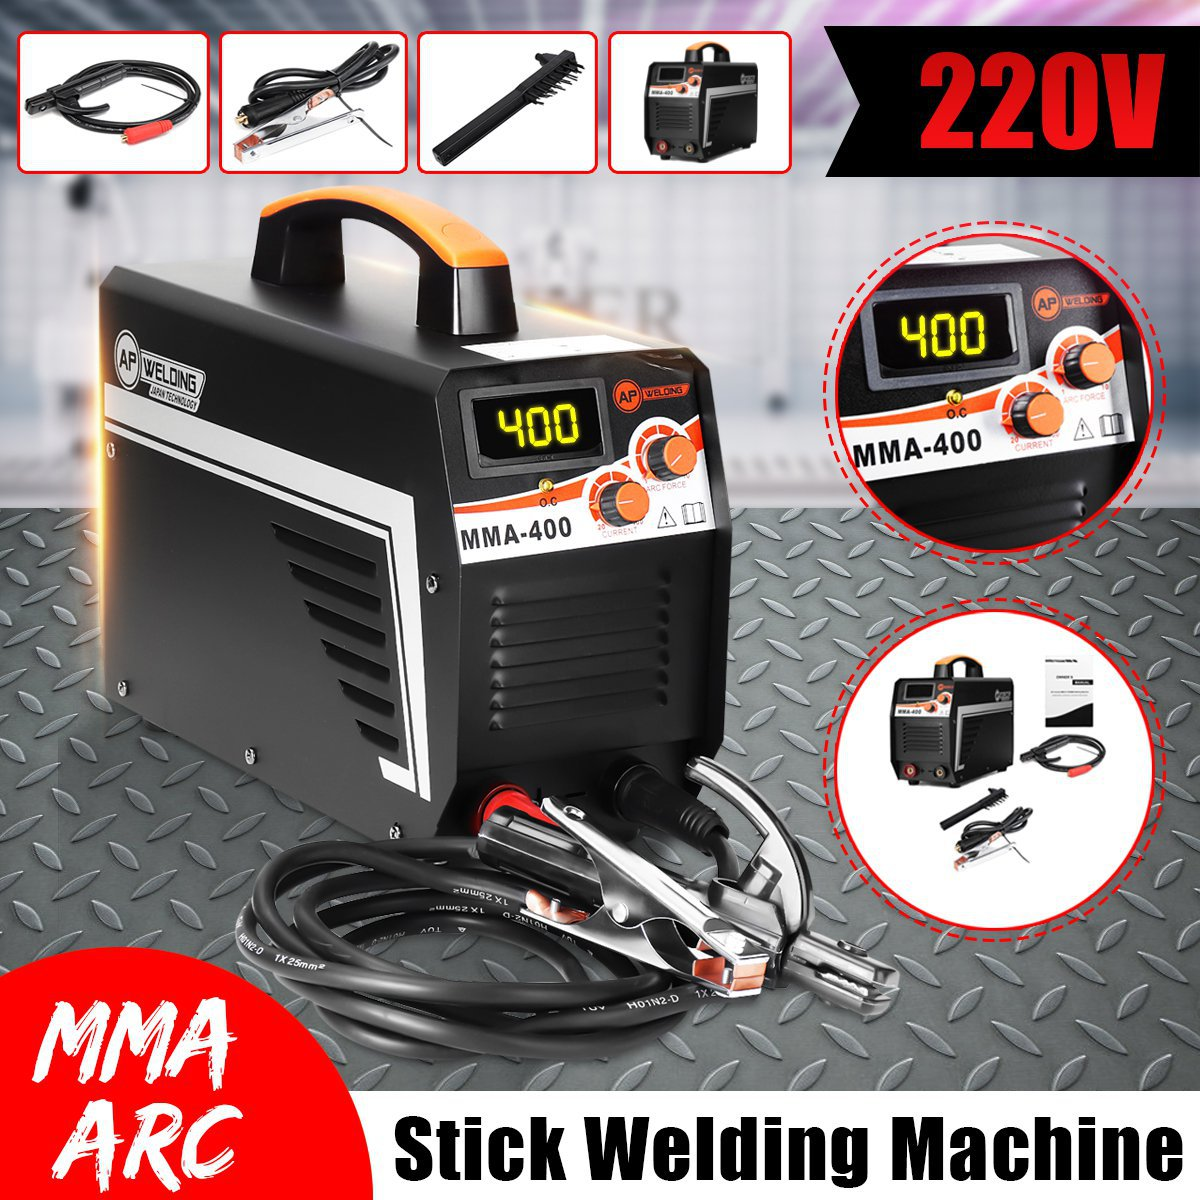 Mini MMA IGBT Inverter Arc Electric Welding Machine 220V Digital Display MMA Arc Stick Welders For Welding Working Machine Tools